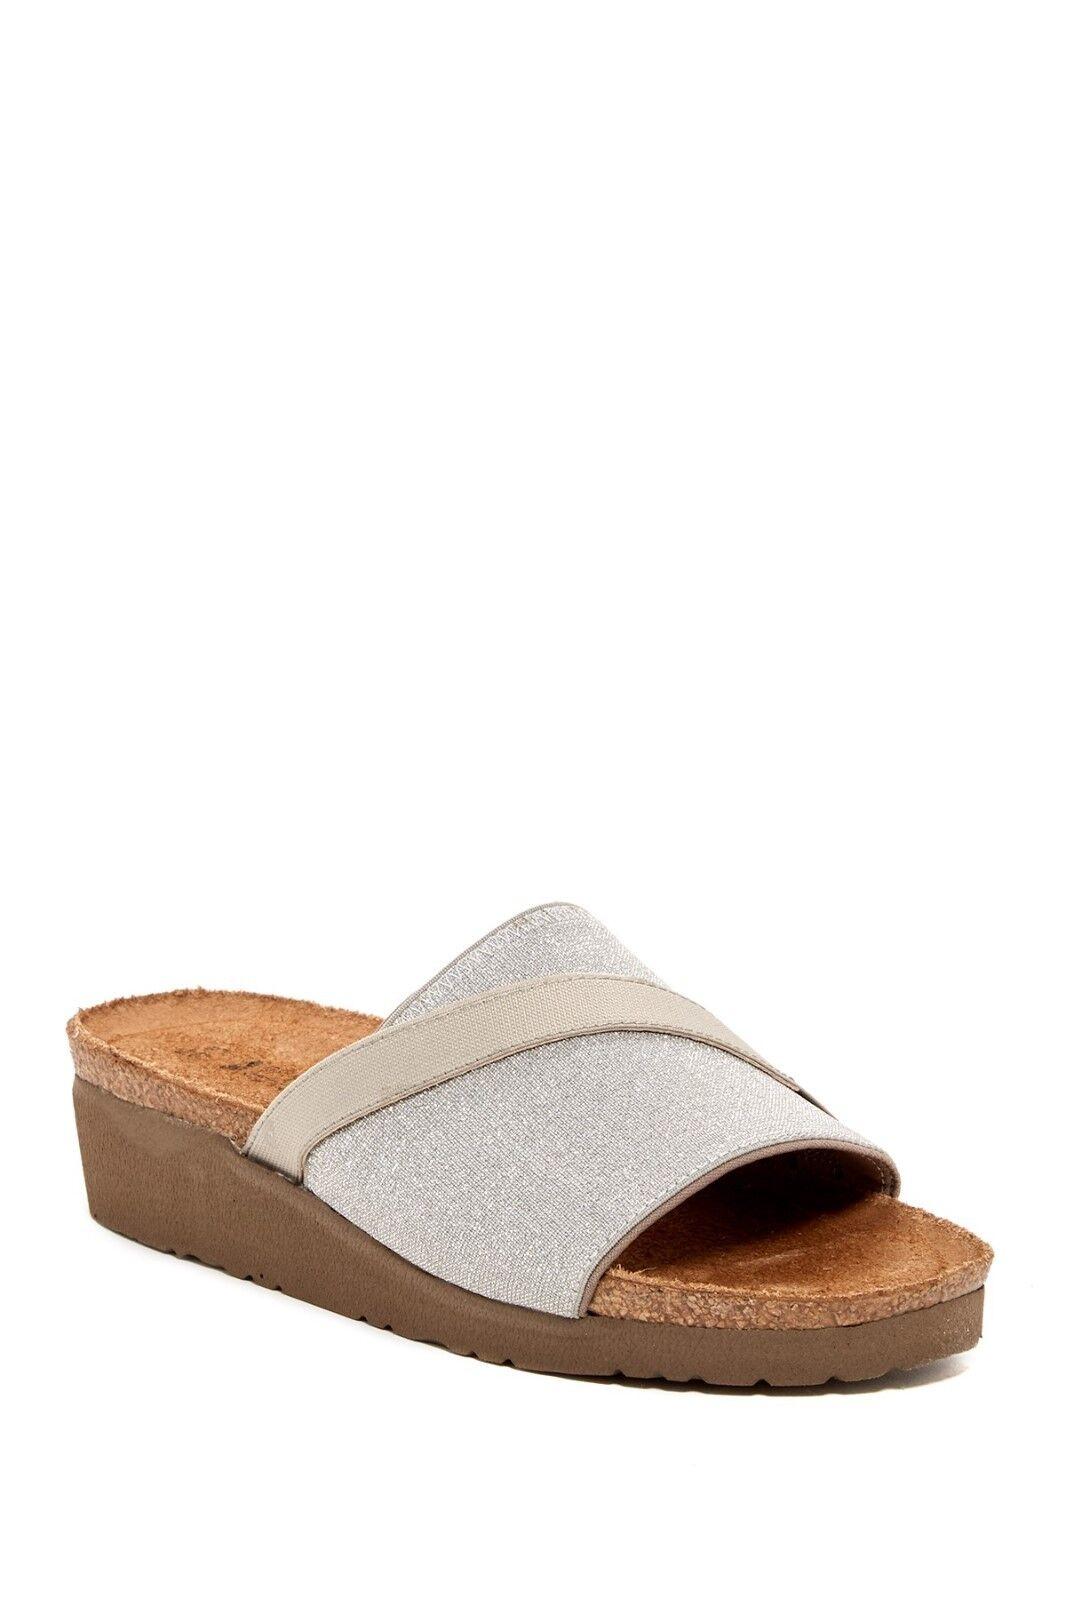 NAOT Sandale Marion Slide ORTHOTIC Wedge Sandale NAOT Mule NIB SILVER SPARKLE Sz 37 - 41 130 5b30bd